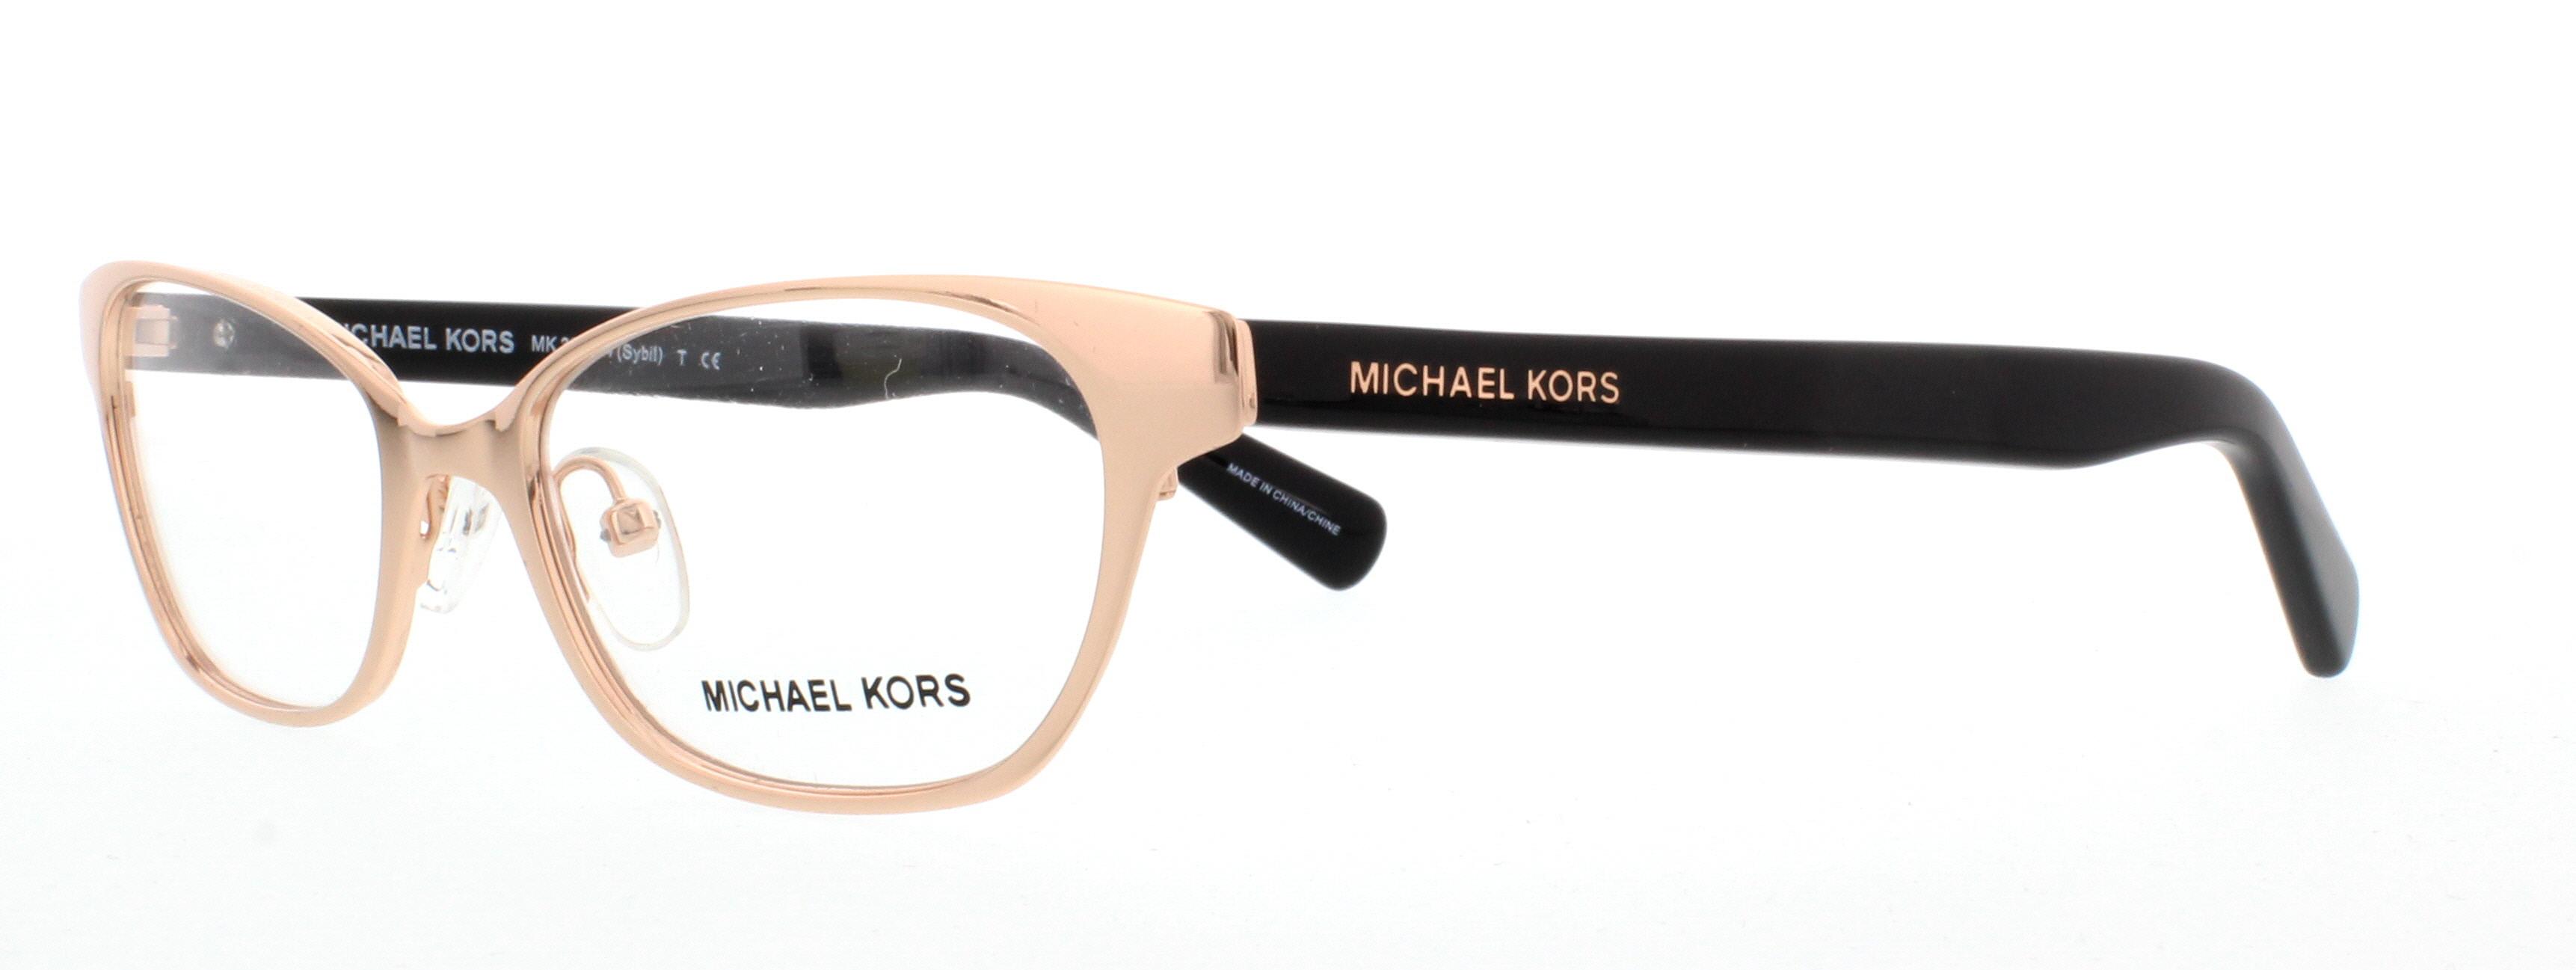 7be9529a0d0 Designer Frames Outlet. Michael Kors MK3014 Sybil